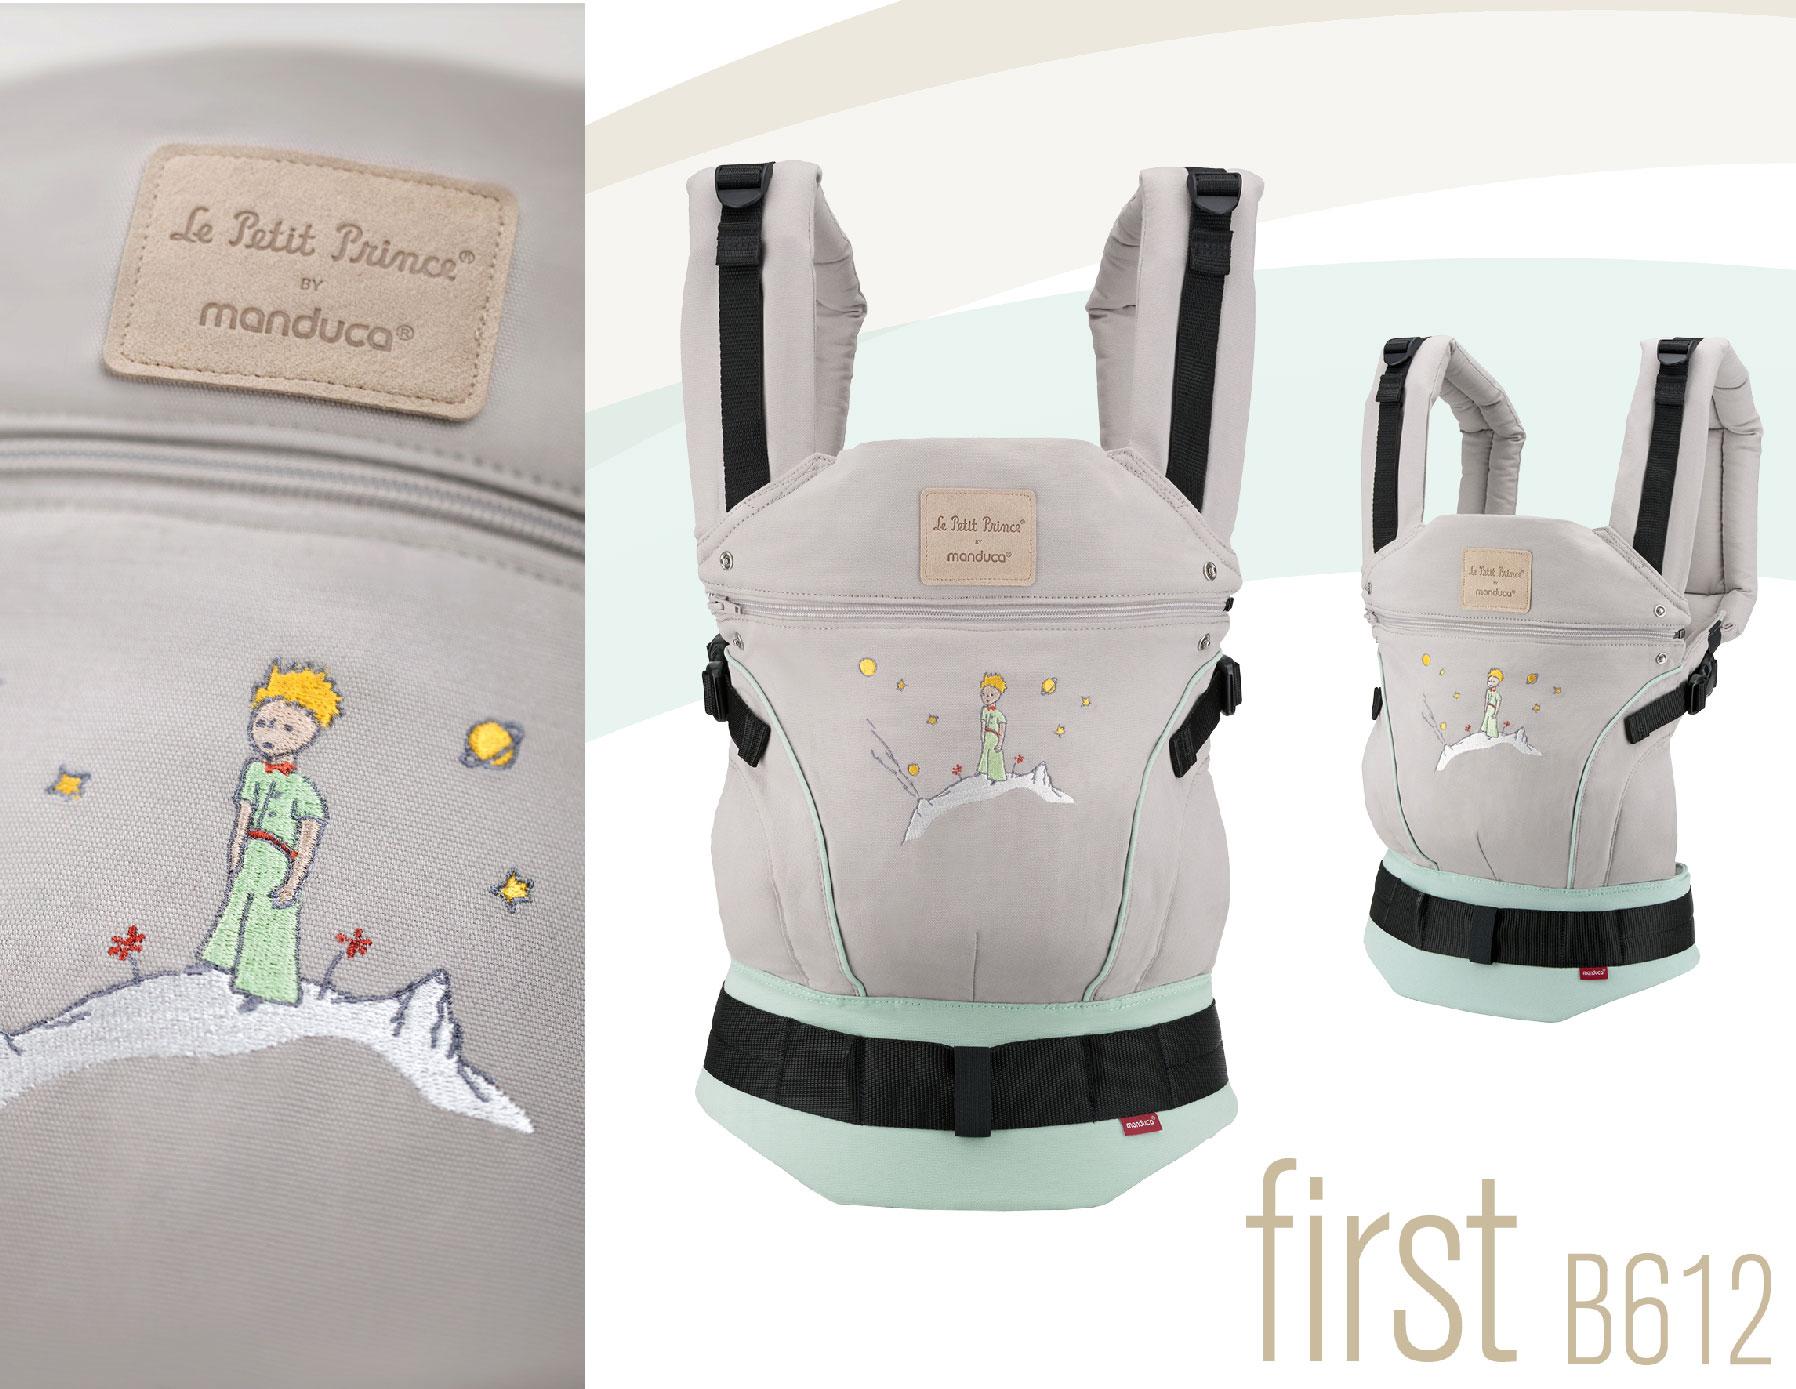 Le Petit Prince First B612